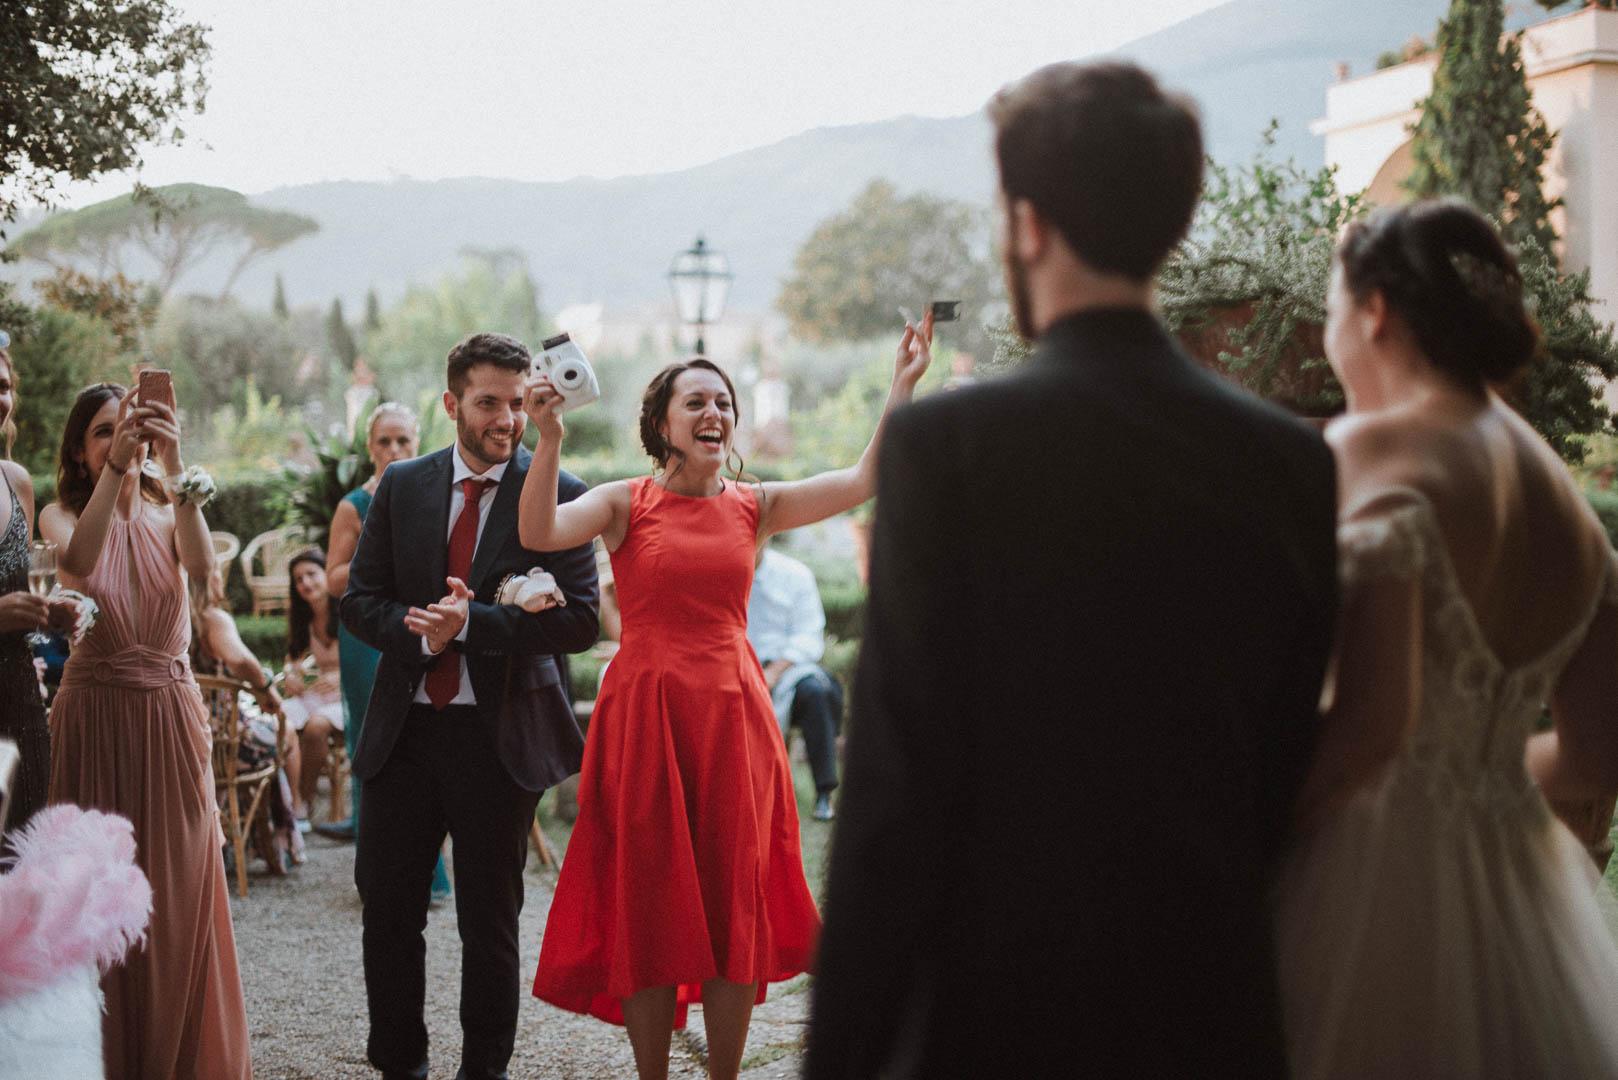 wedding-photographer-destination-fineart-bespoke-reportage-tuscany-villascorzi-vivianeizzo-spazio46-134